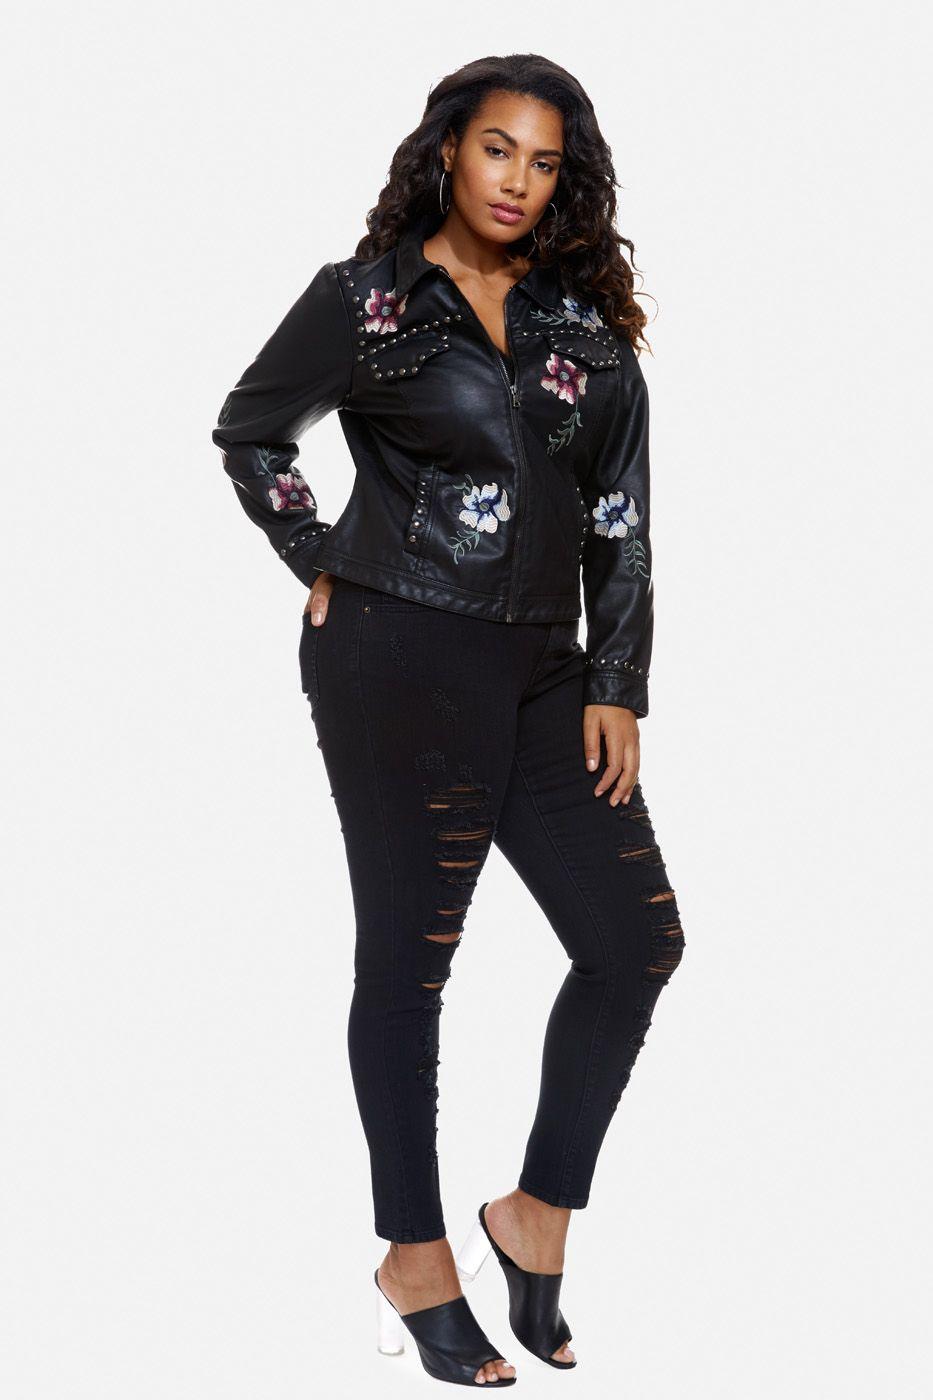 Plus Size Yumi Floral Embroidery Faux Leather Jacket Fashion Fashion To Figure Plus Size Fashion [ 1400 x 933 Pixel ]